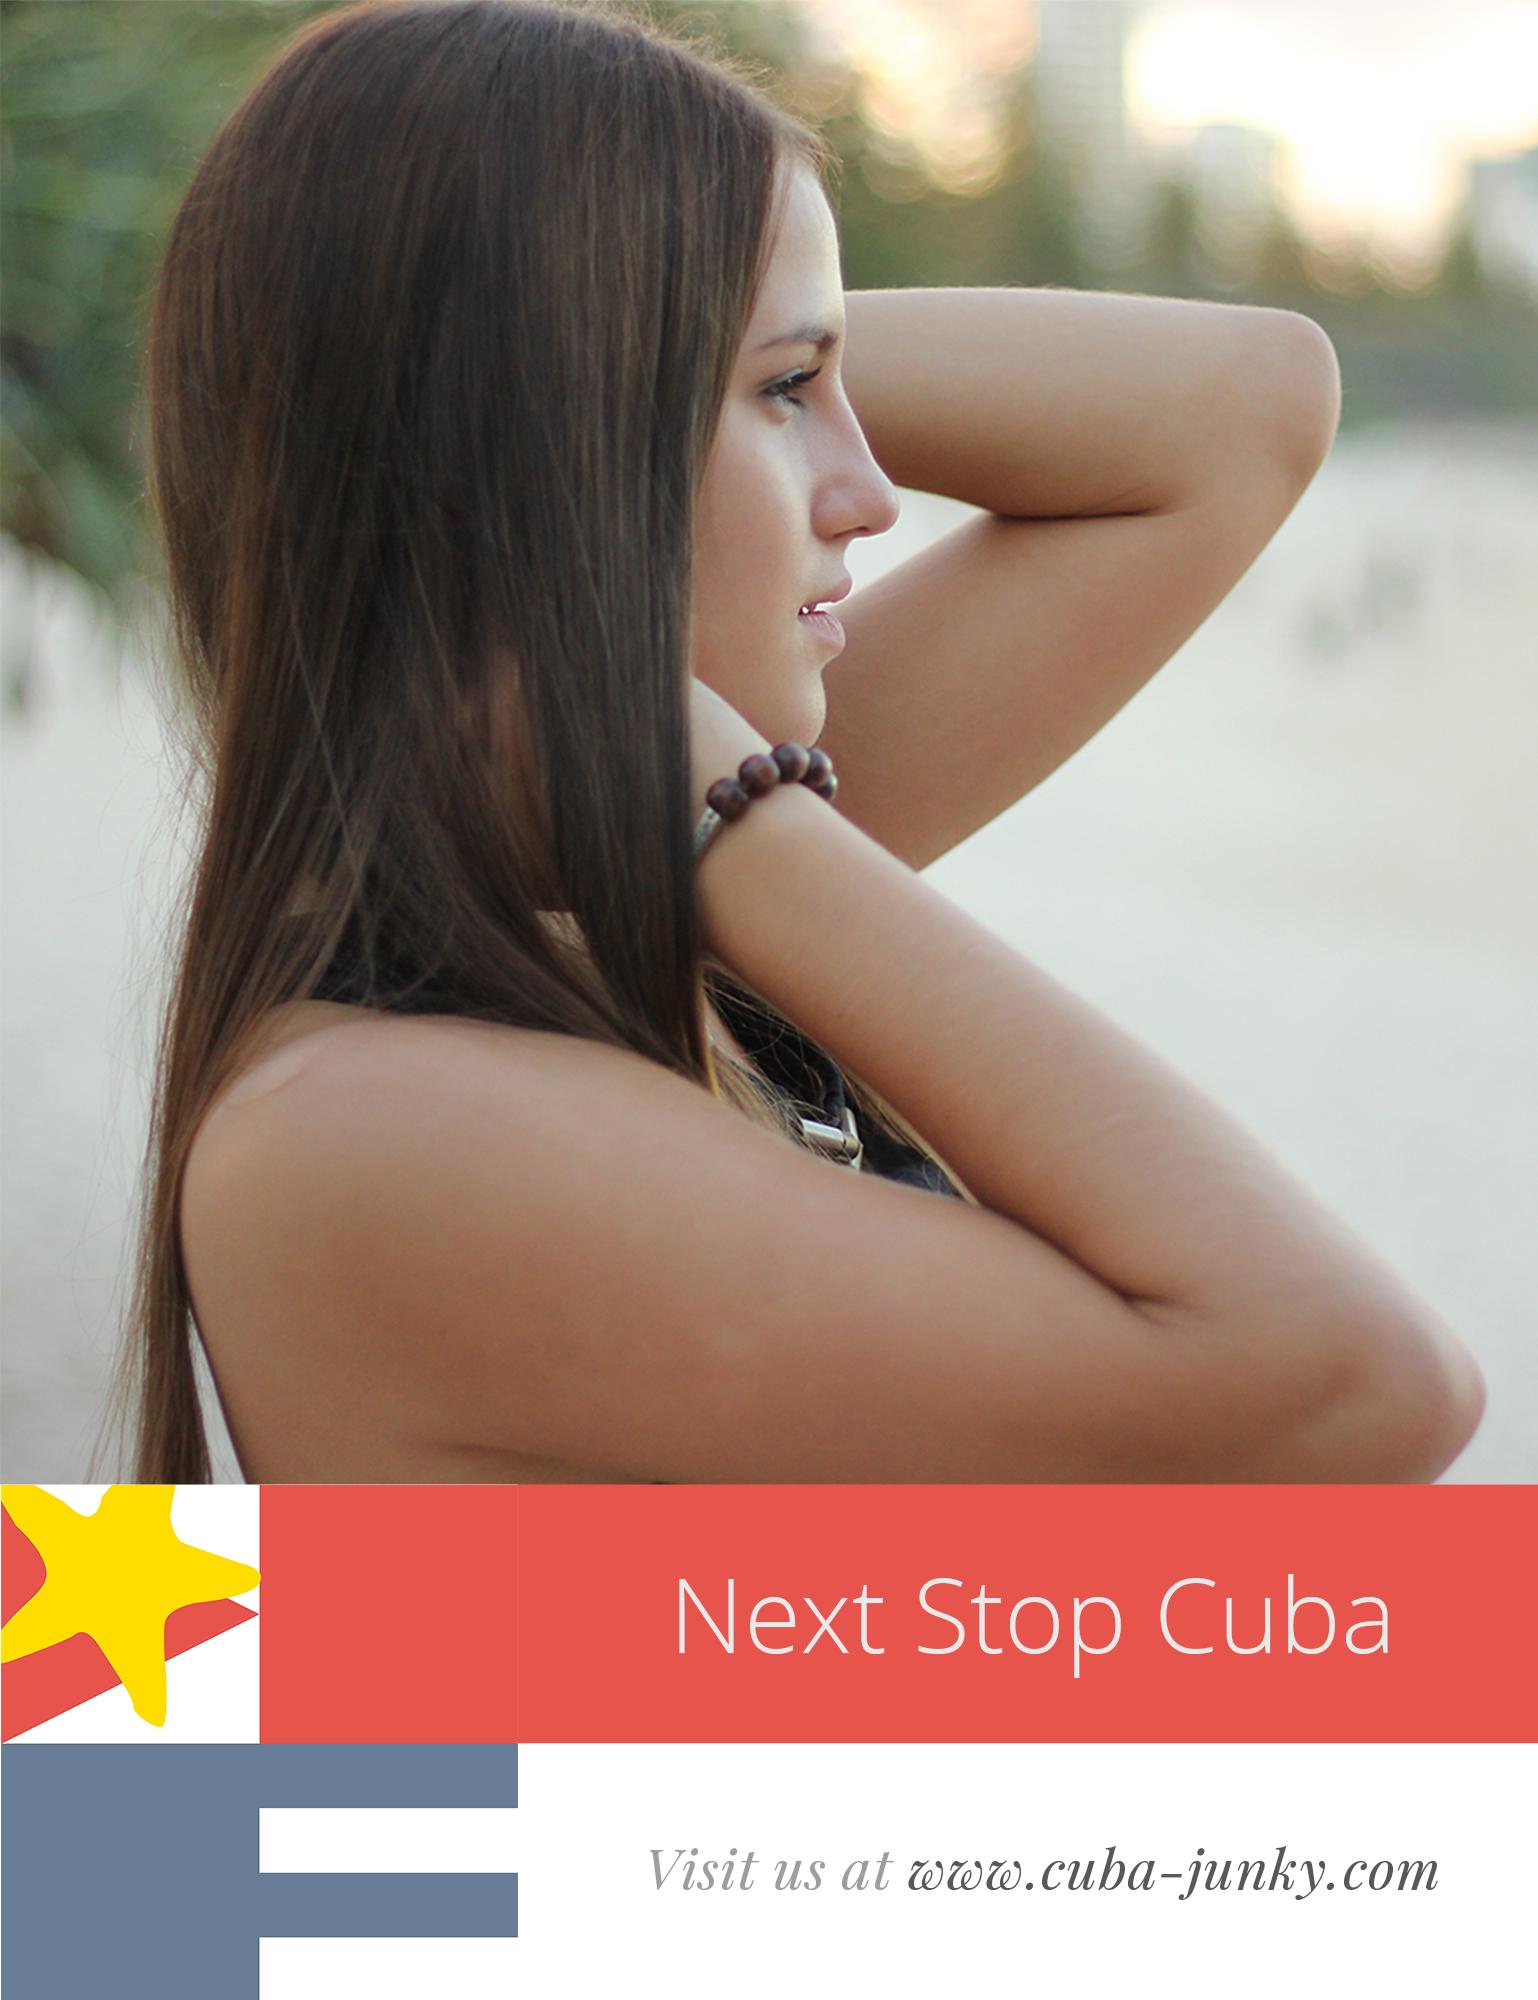 Next stop Cuba! Cuba travel info - Cuban locals in the lead - Cuba-Junky #cuba #travel